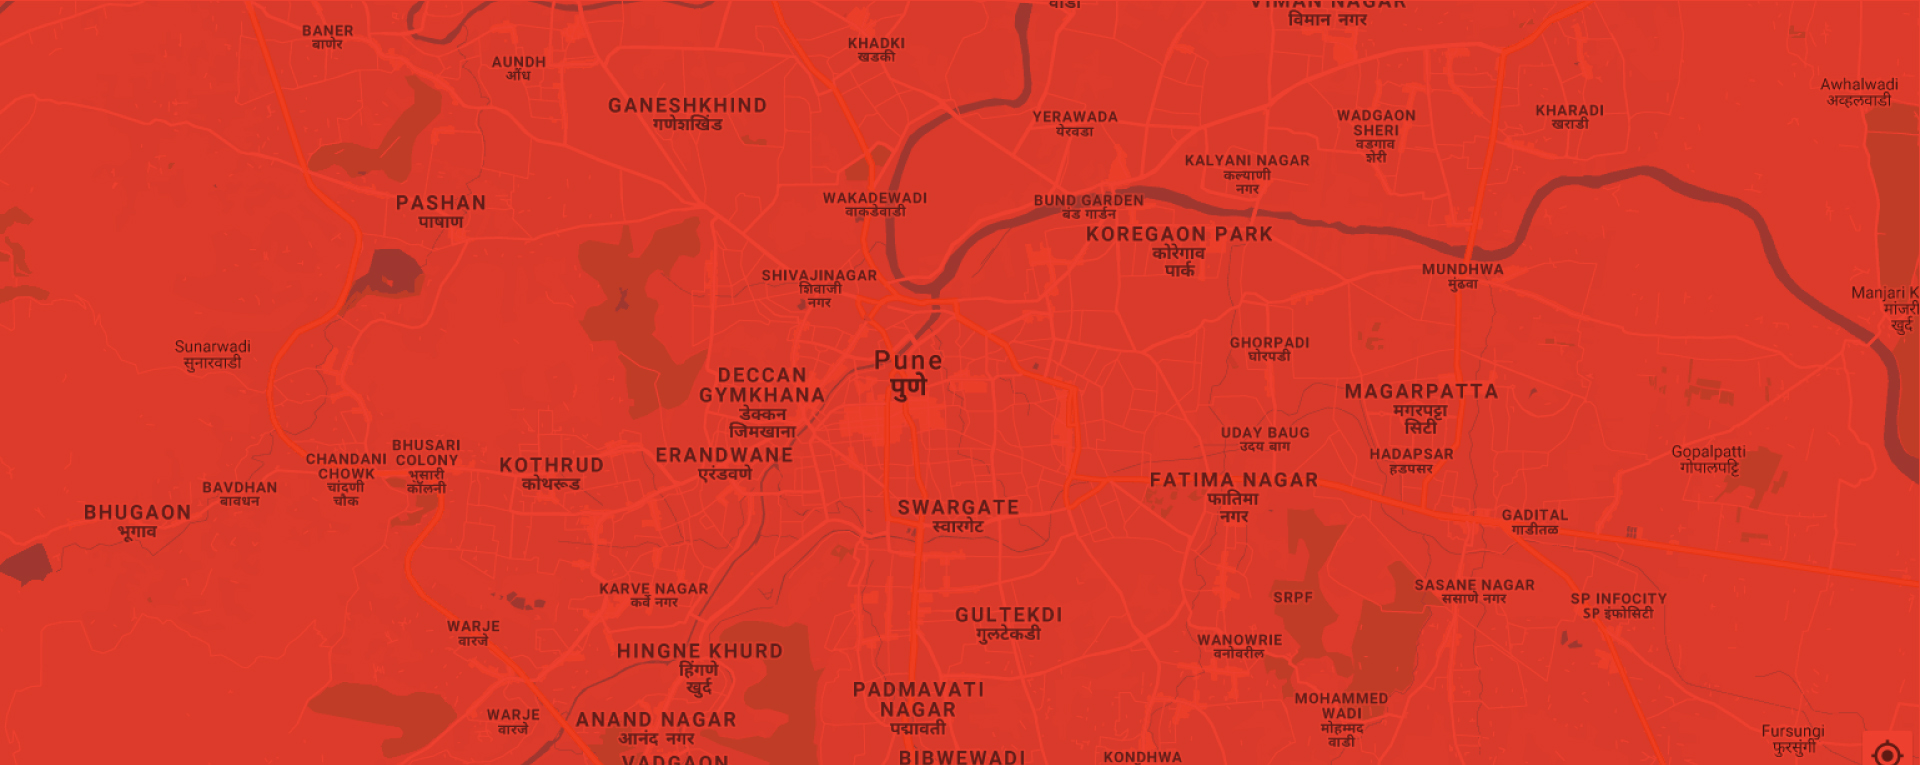 Pune Banner Image